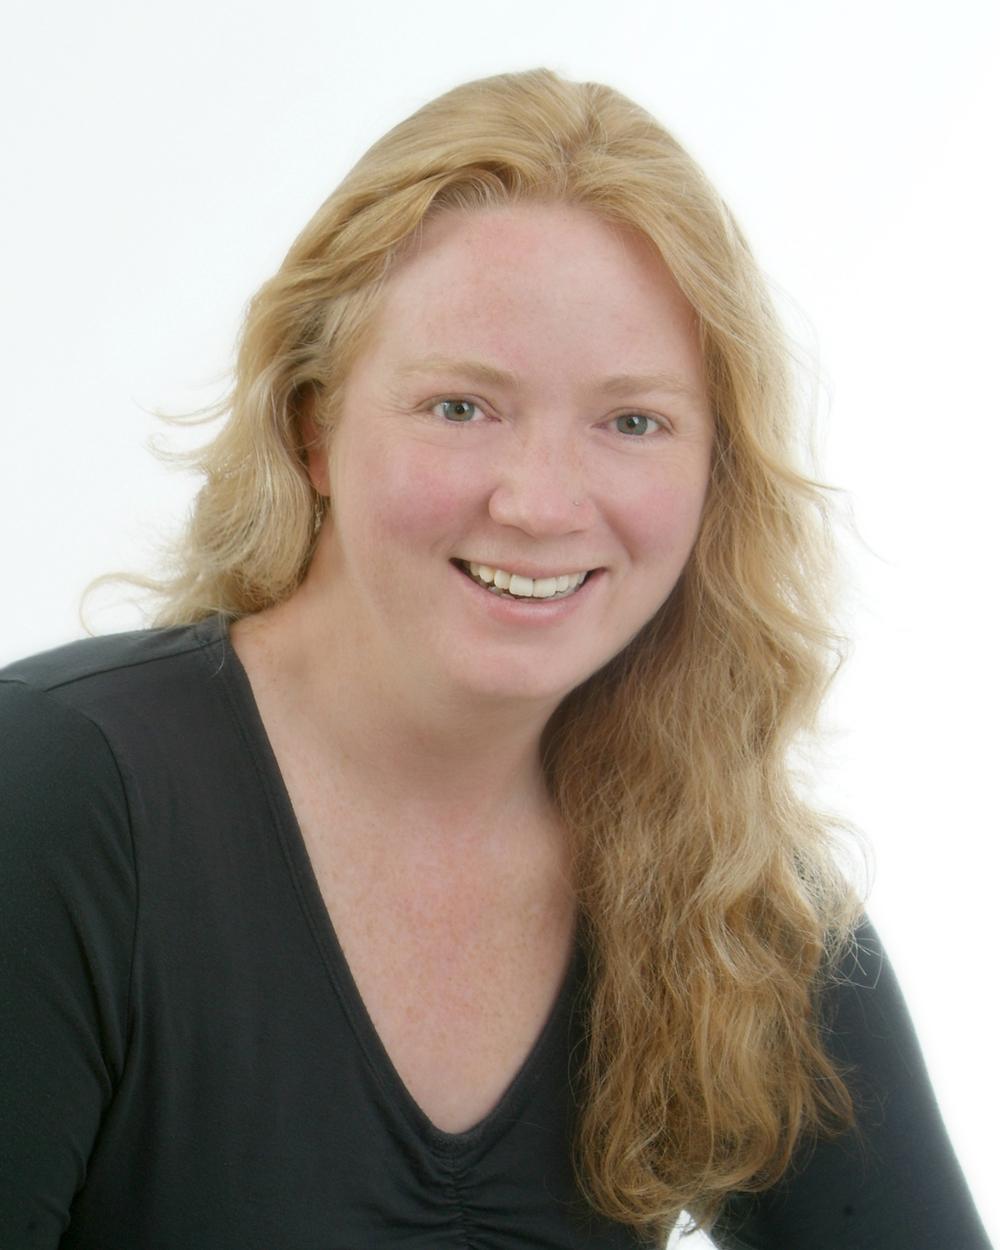 Jessica Schiewe QA/QC Manager